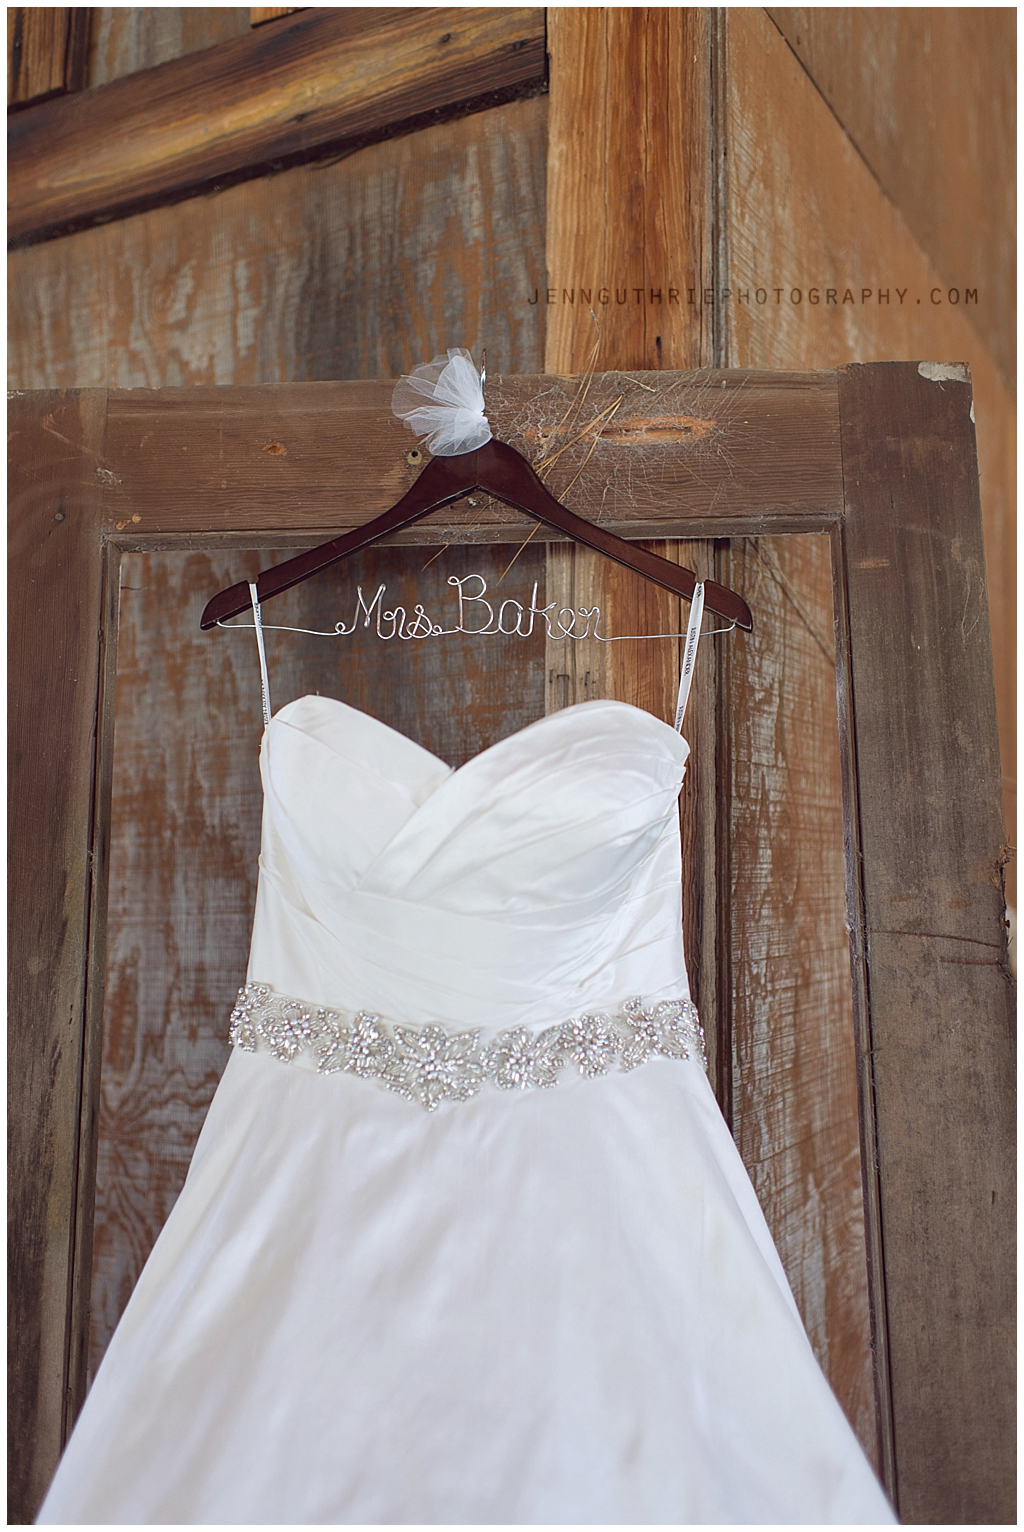 Jenn Guthrie Photography - Jacksonville Wedding Photography_0006.jpg